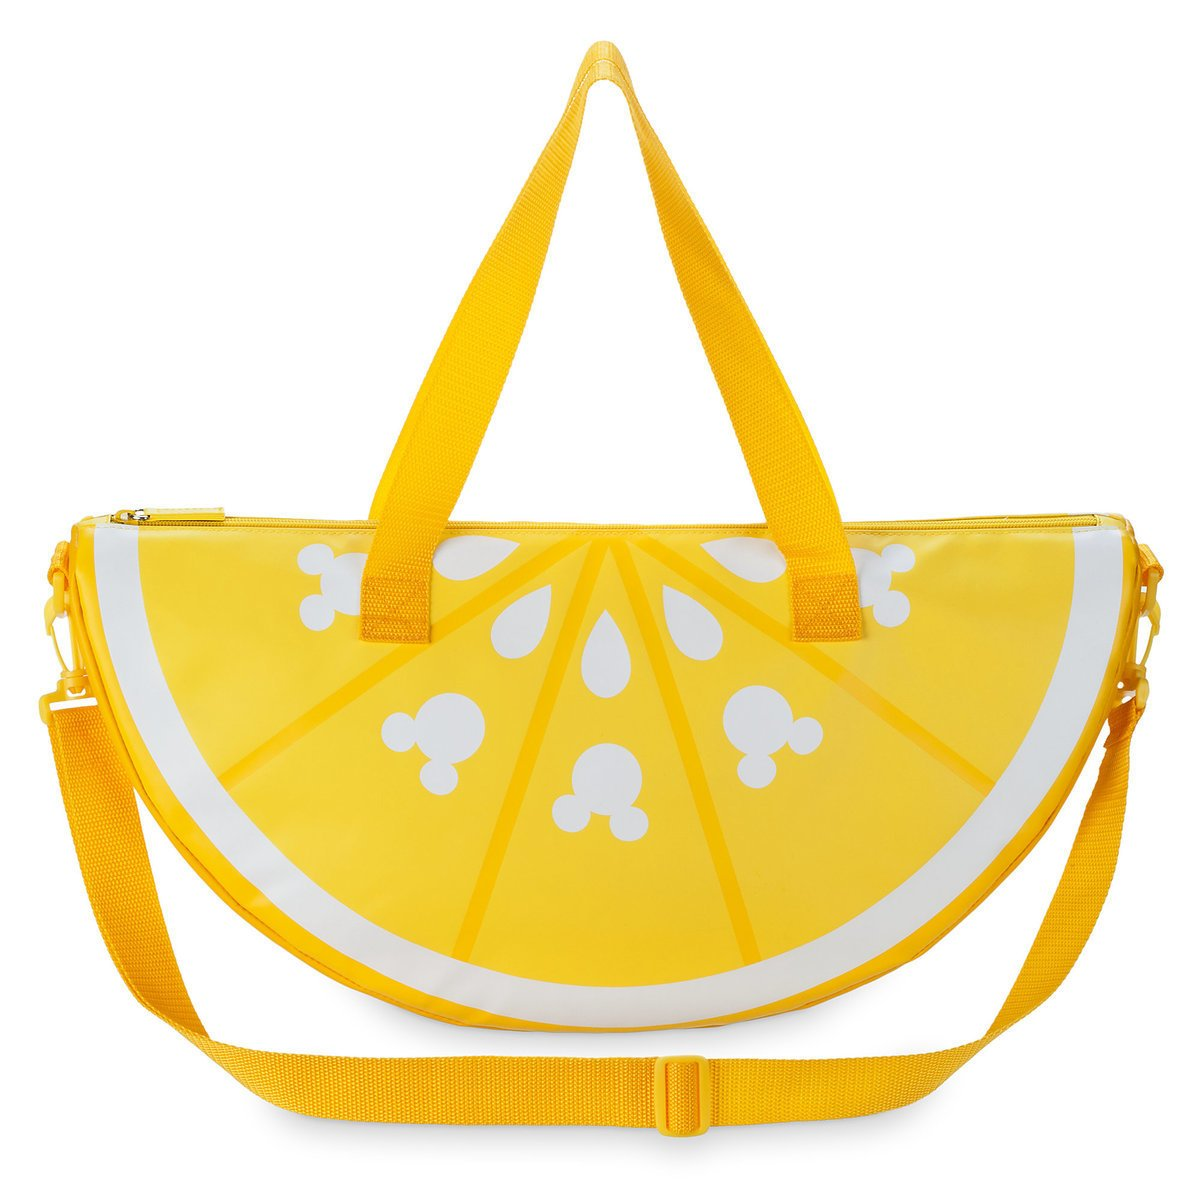 Disney Mickey Mouse Lemon Wedge Cooler Bag - Summer Fun